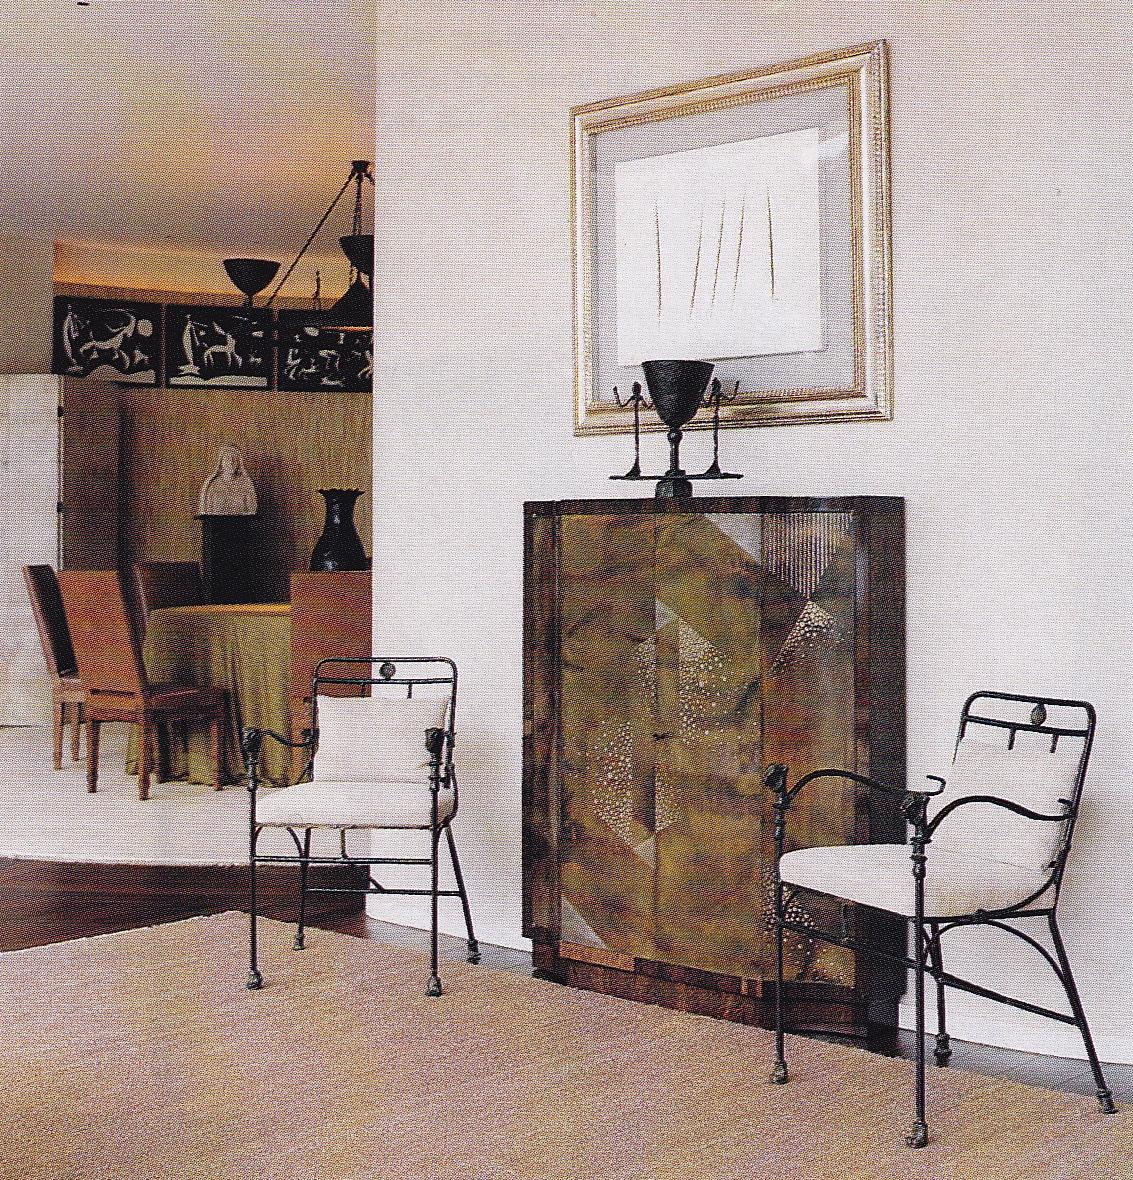 Riviera Style Villa Nara Mondadori Cristopher Worthland